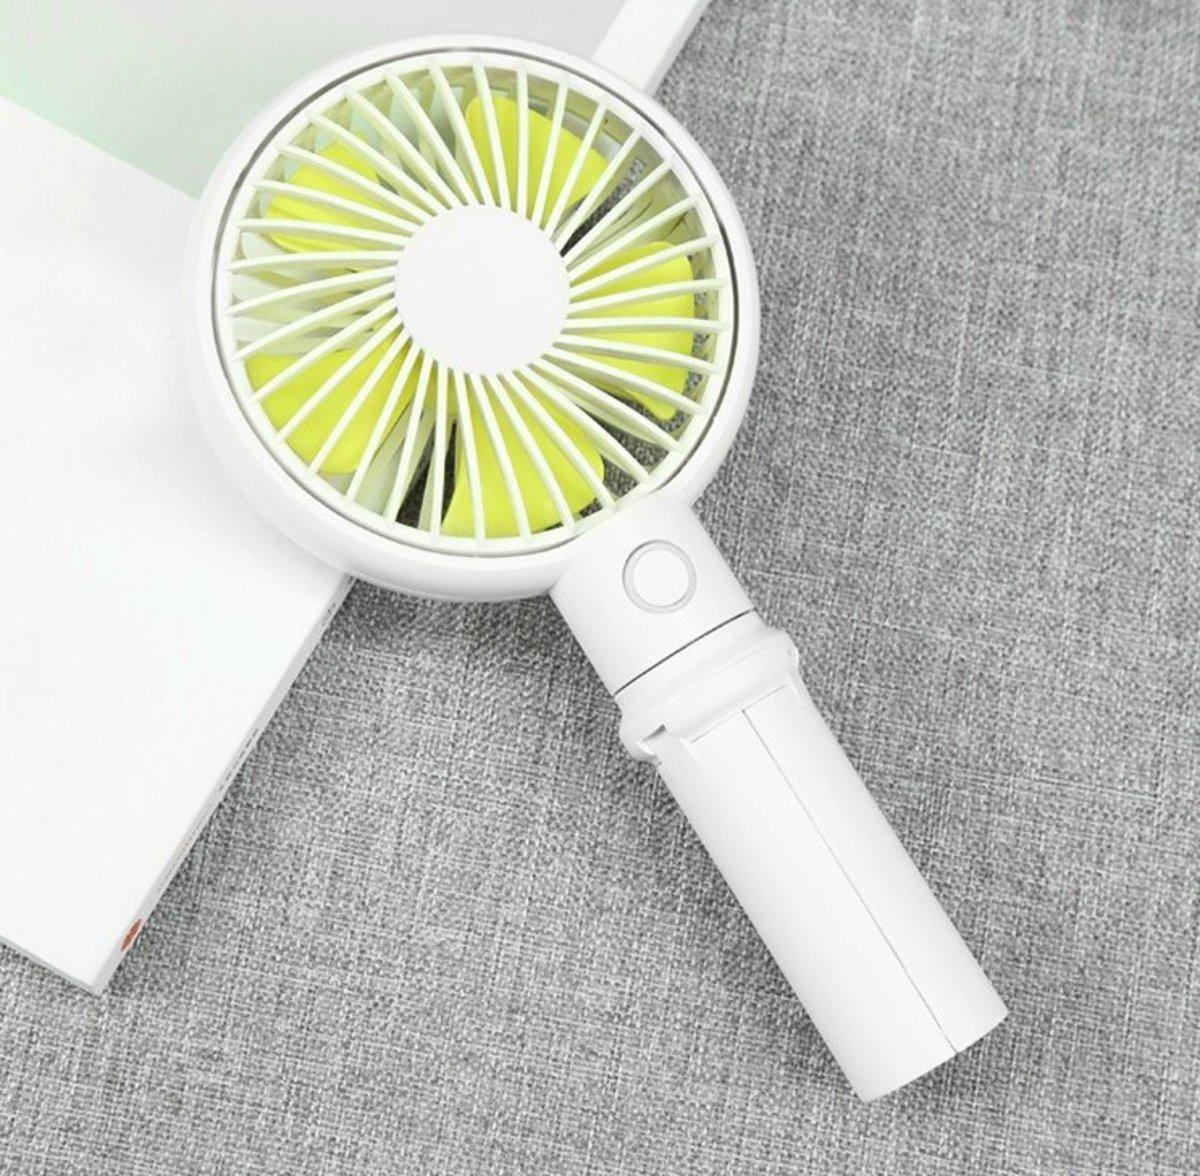 Benks Mini Hand Carry Multi-Function Fan -- White